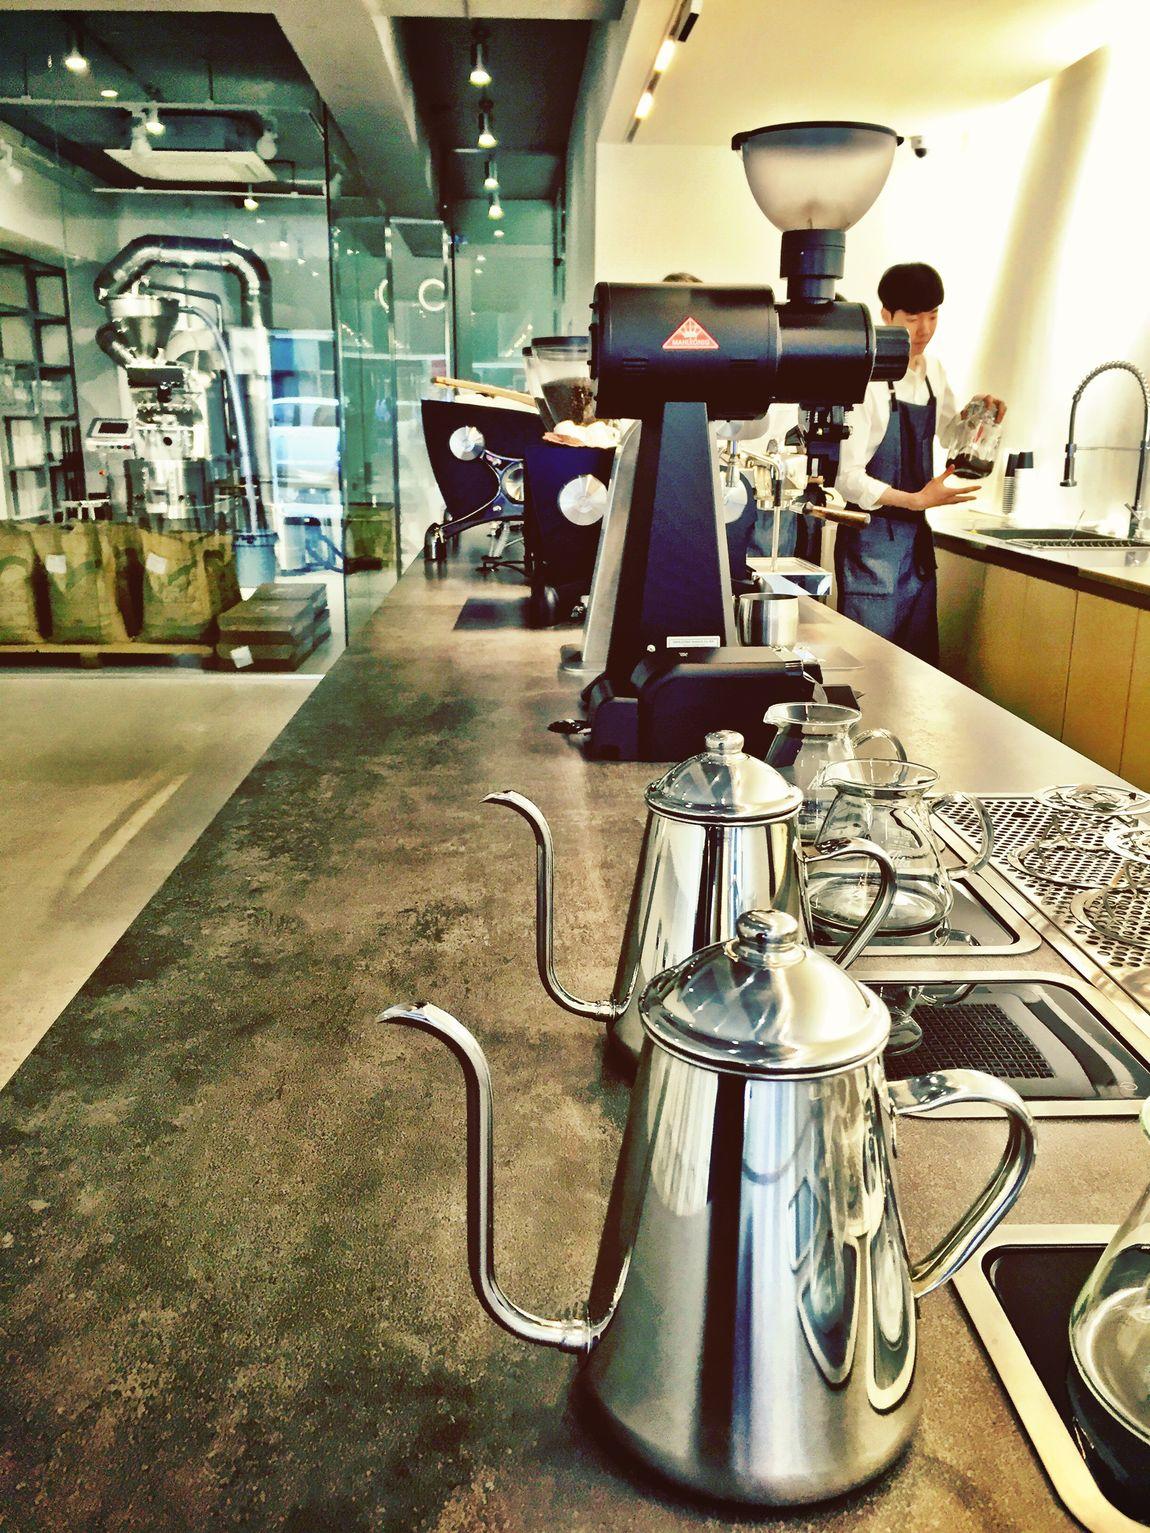 Devastate, the team at work Seoul, Korea Coffee Shop Having A Break Espresso Coffee Gangnam Seoul_korea Seoul Amazing Design Coffee Roasters Modern Architecture